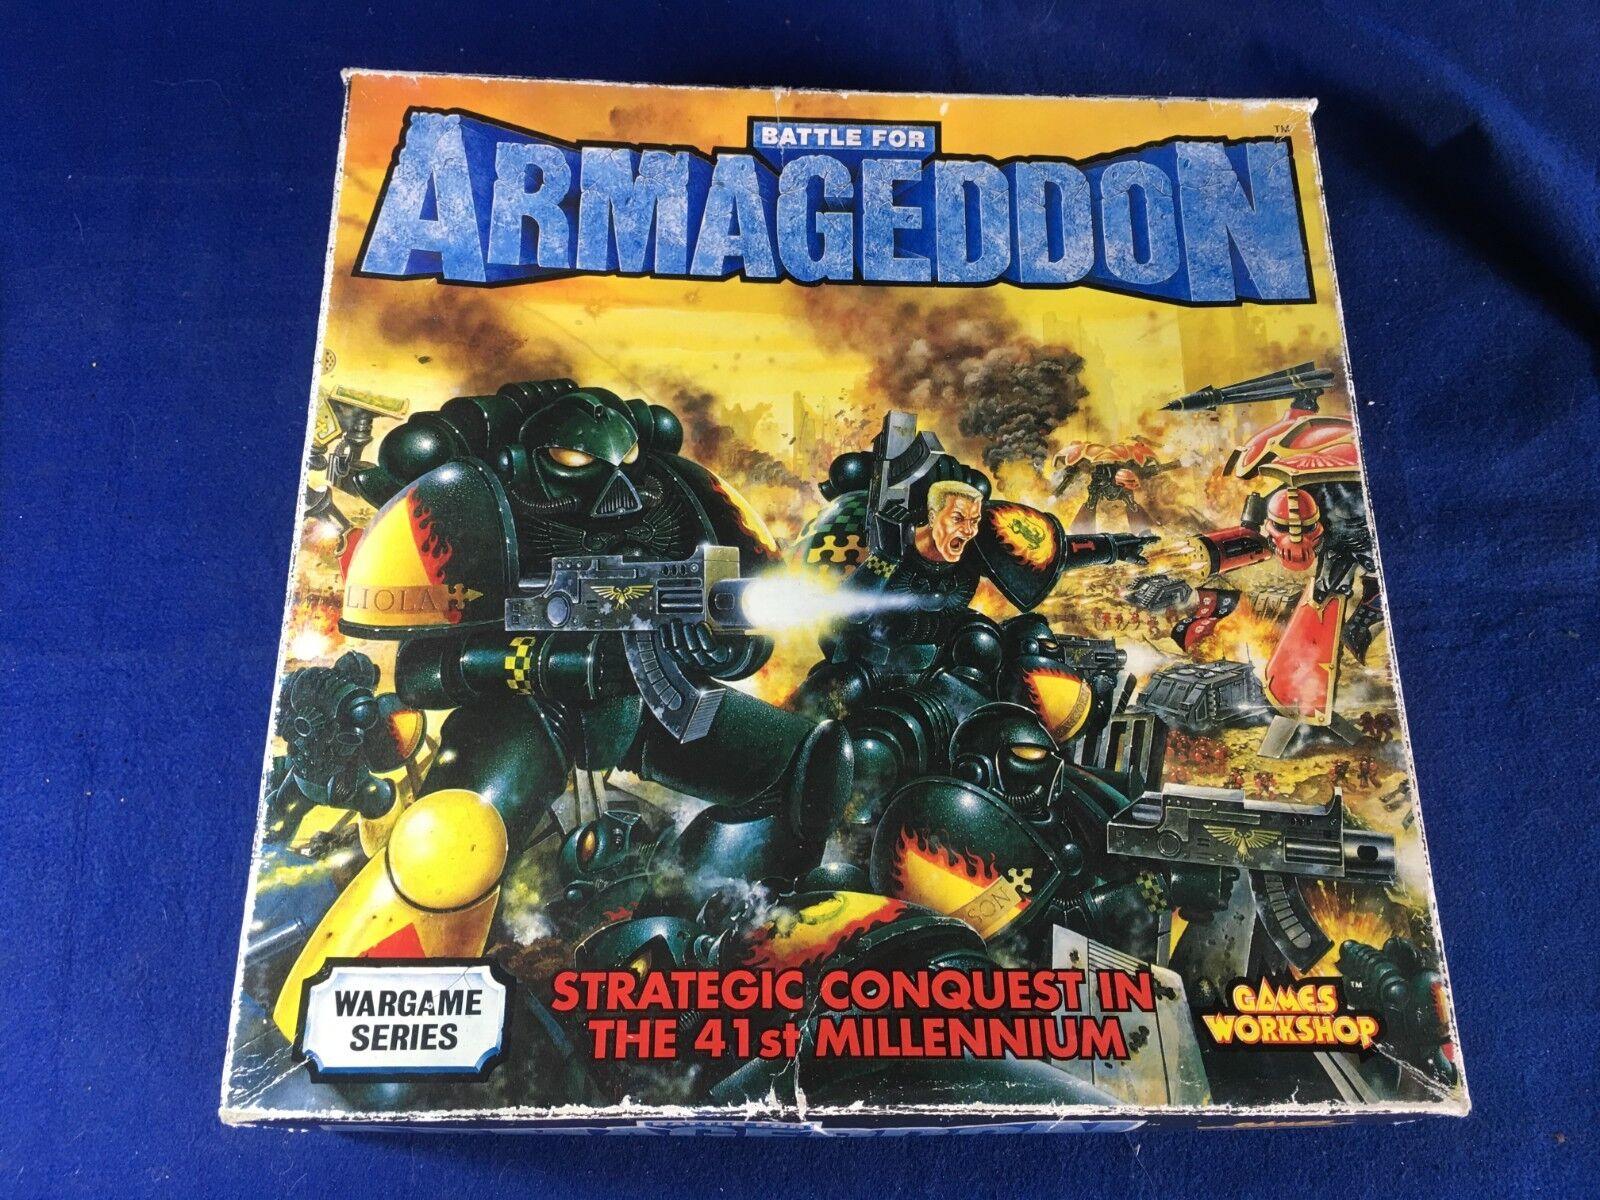 JUEGO DE ESTRATEGIA BATTLE FOR ARMAGEDOON DE GAMES WORKSHOP